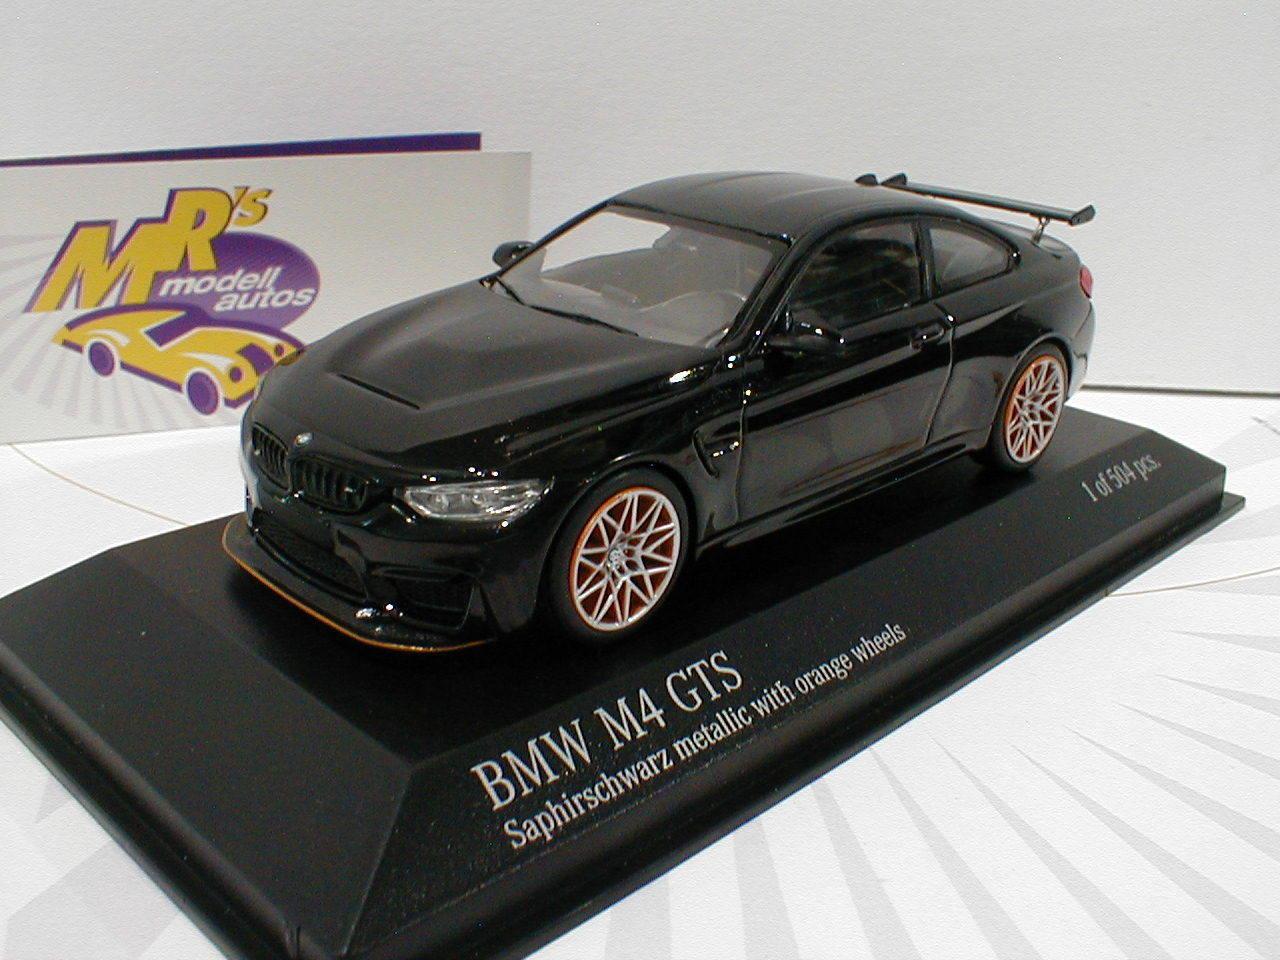 Minichamps 410025222 - BMW M4 GTS Bj. 2016 schwarzmetallic 1 43 Lim.Ed. 504 pc  | Angemessener Preis